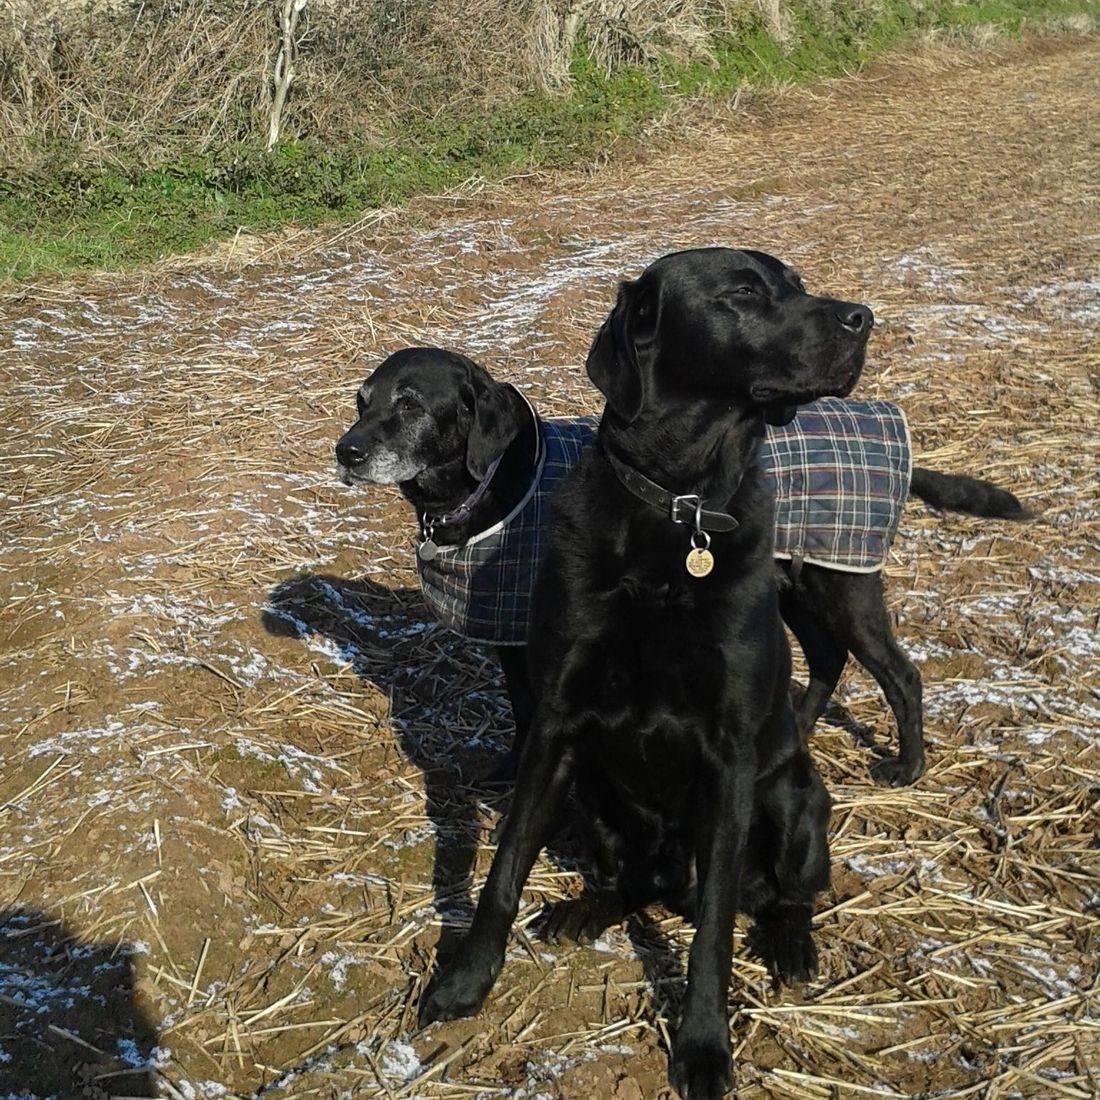 Black labradors in the field